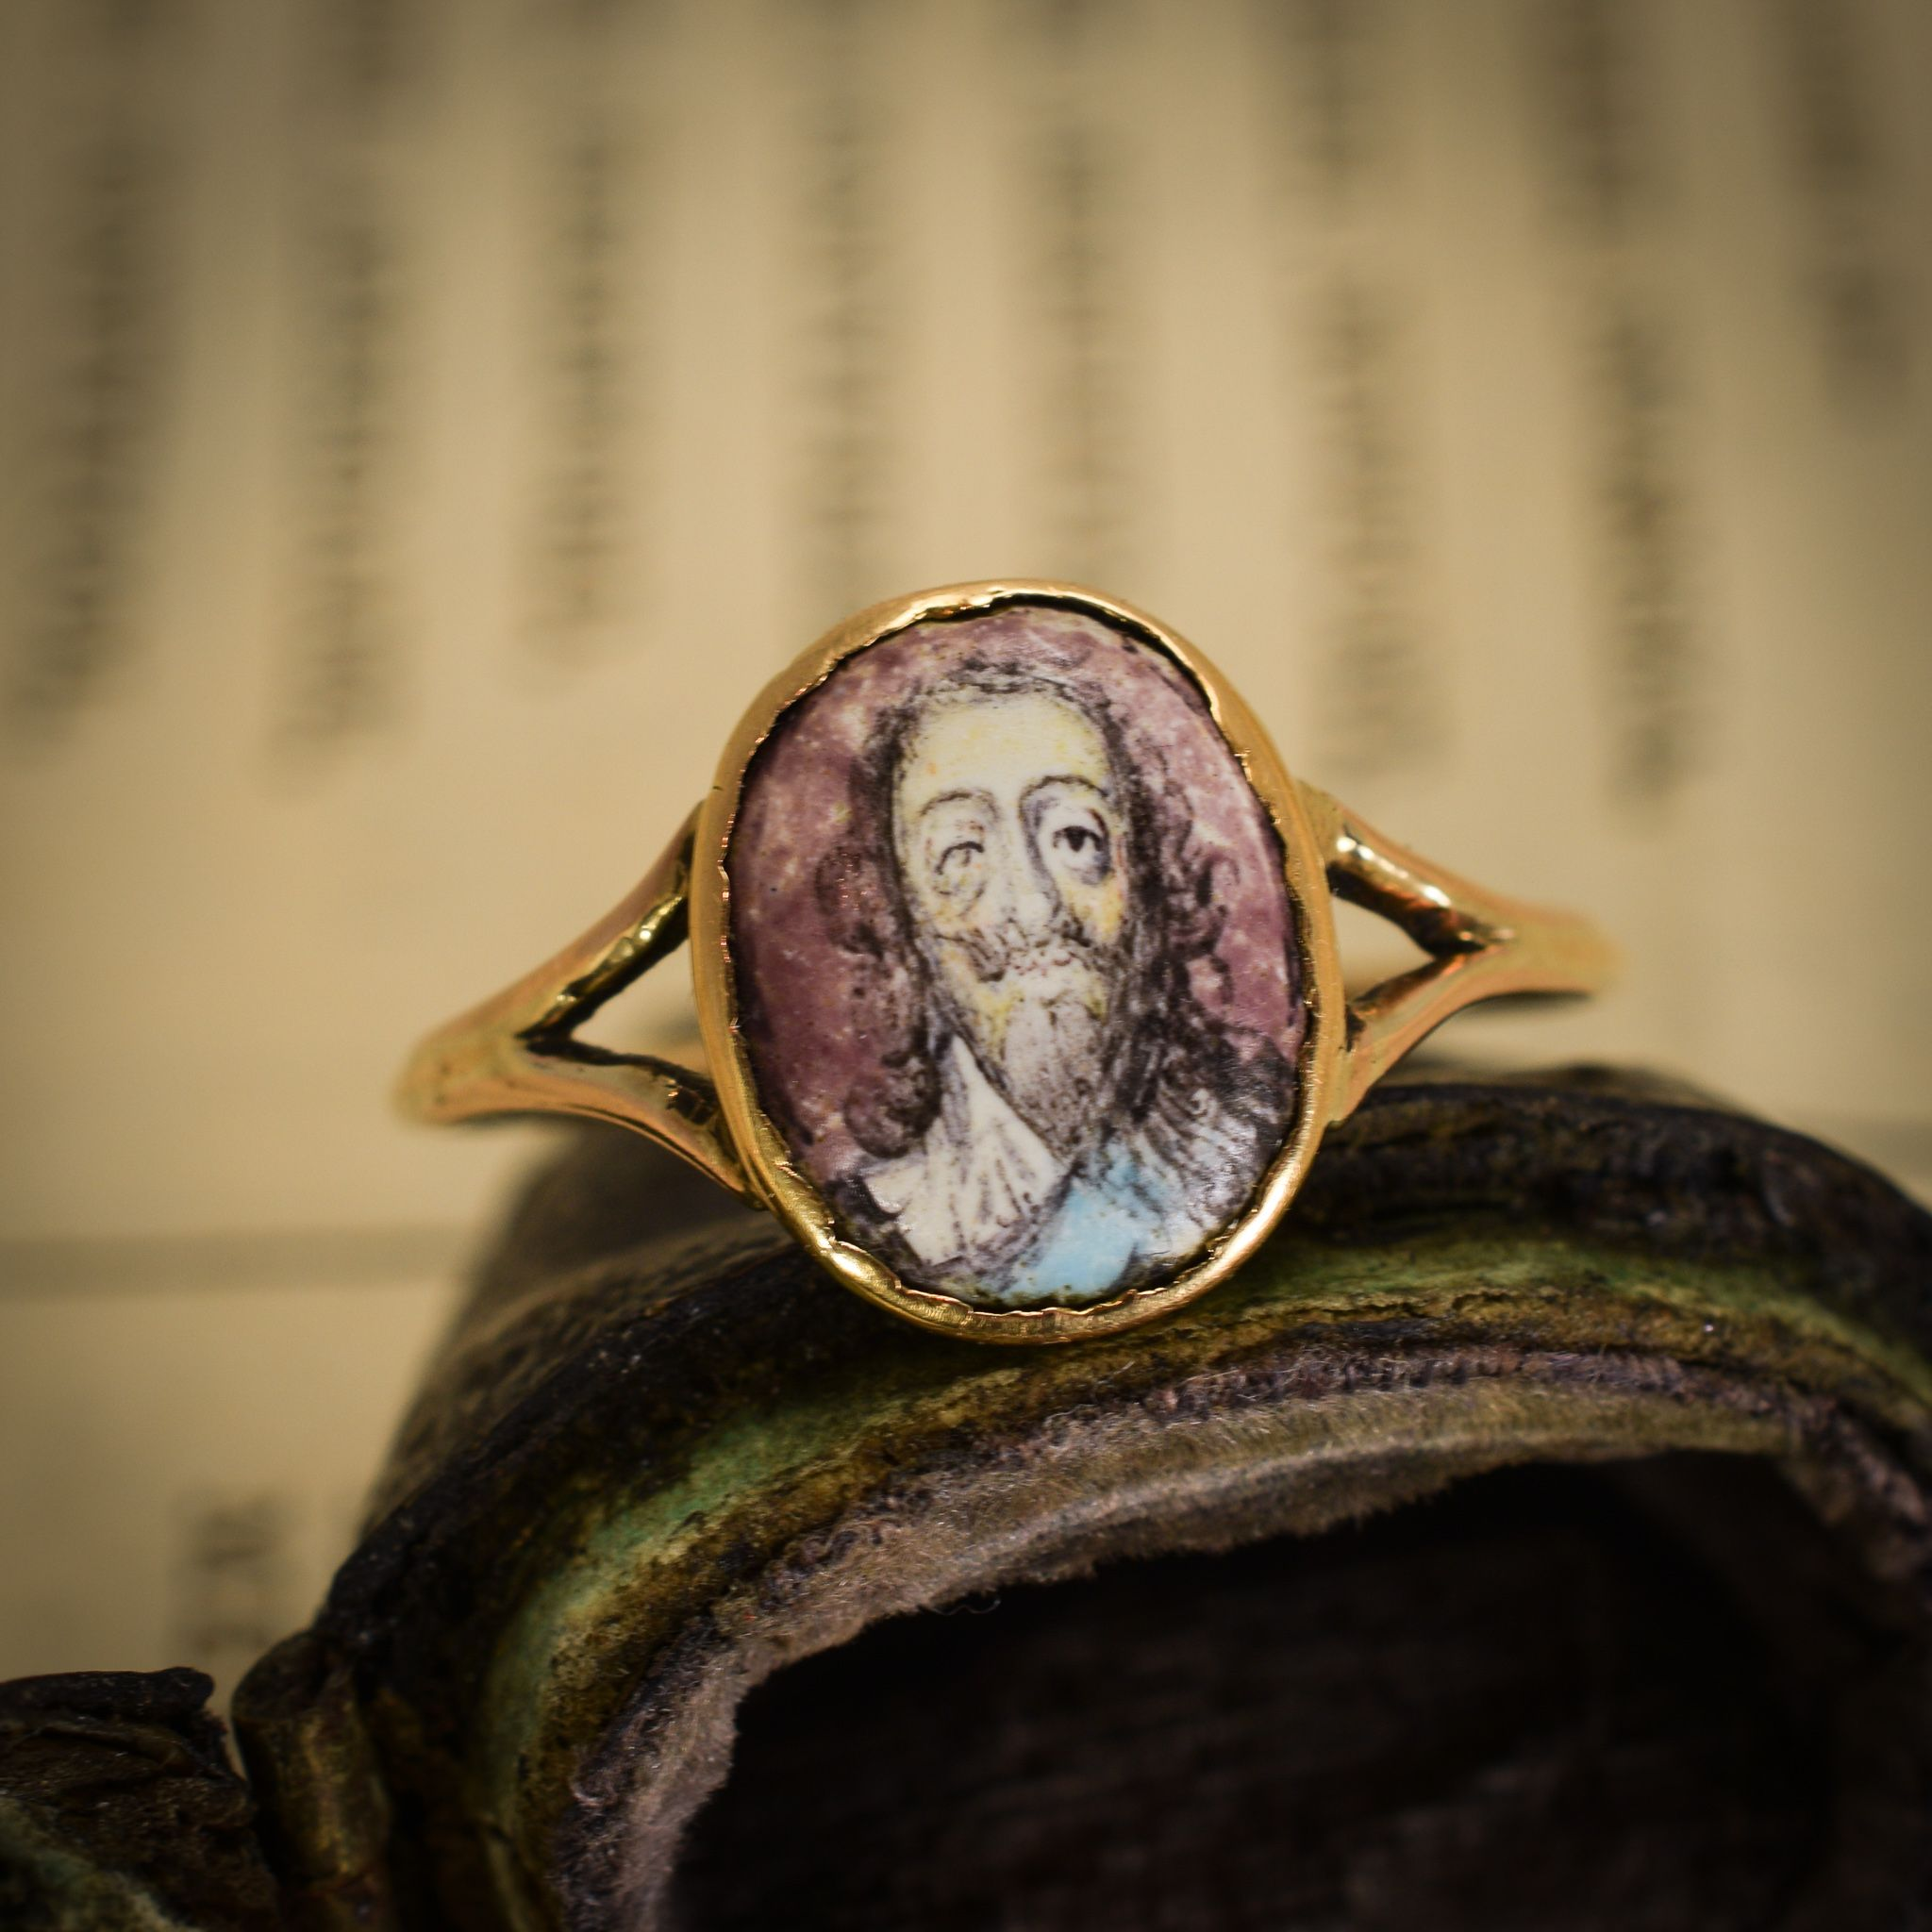 Rare 17th Century Charles I Memorial Ring Rings, Old